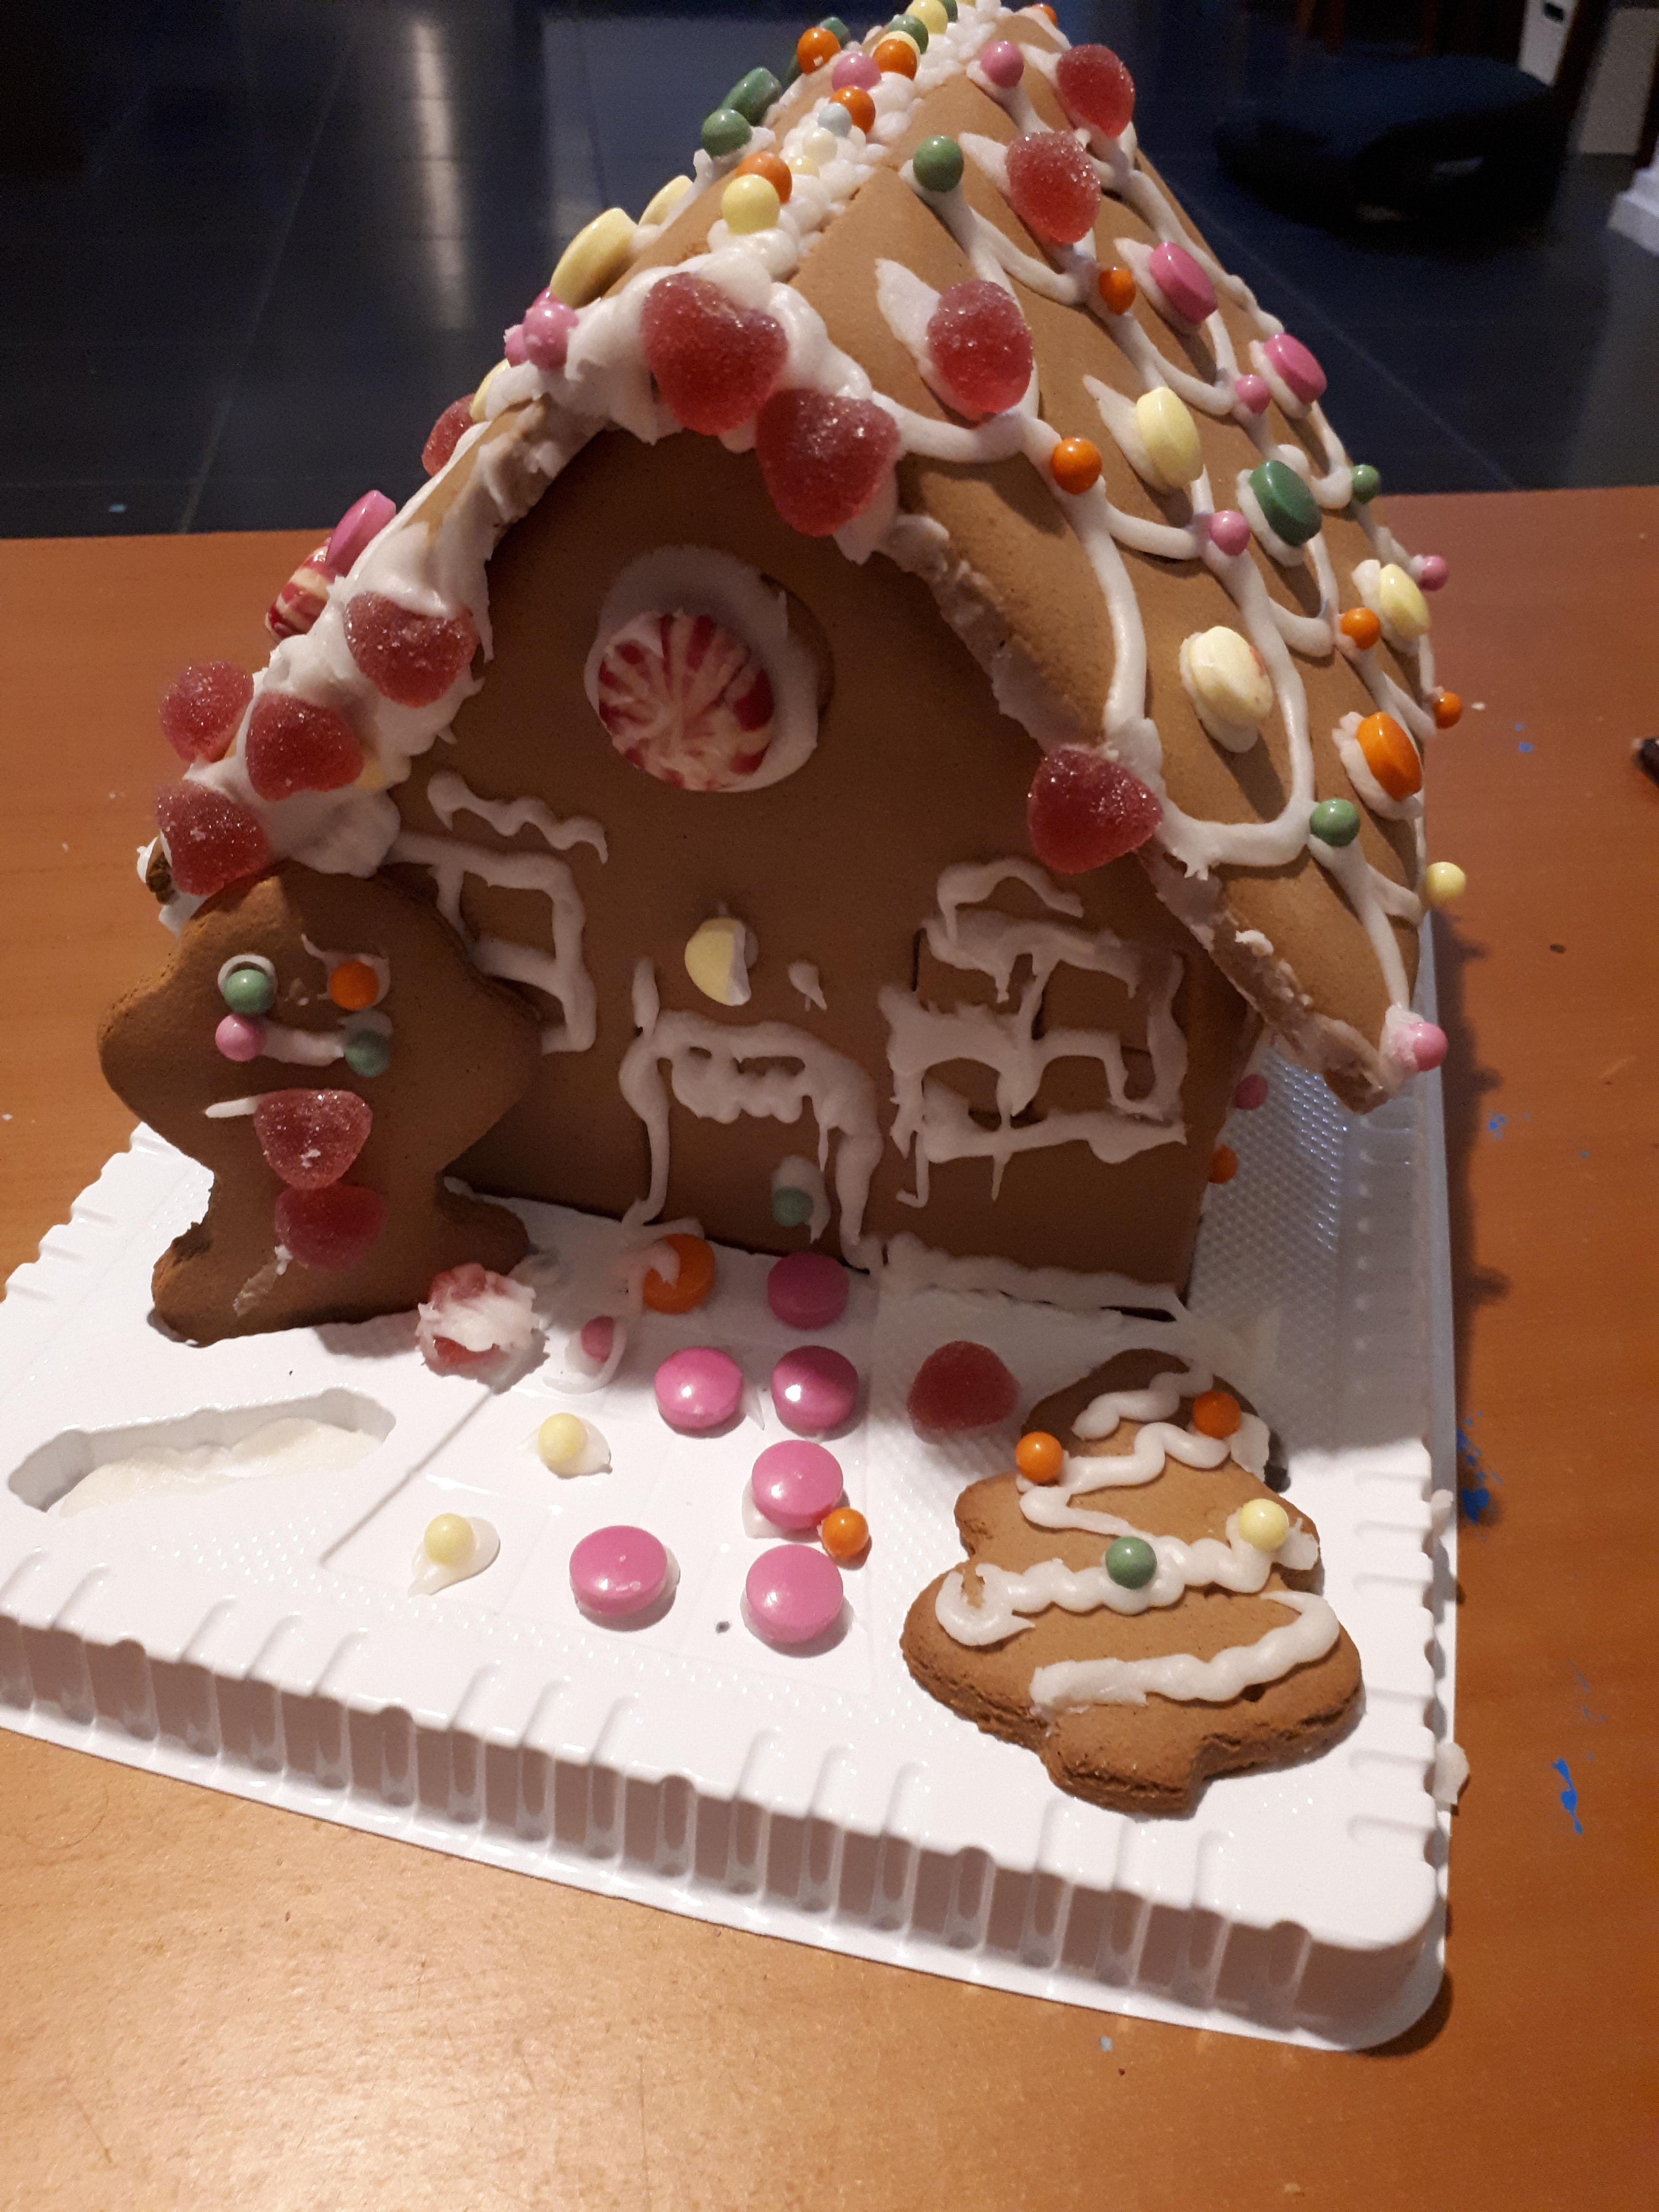 Vegan Gingerbread House.jpg